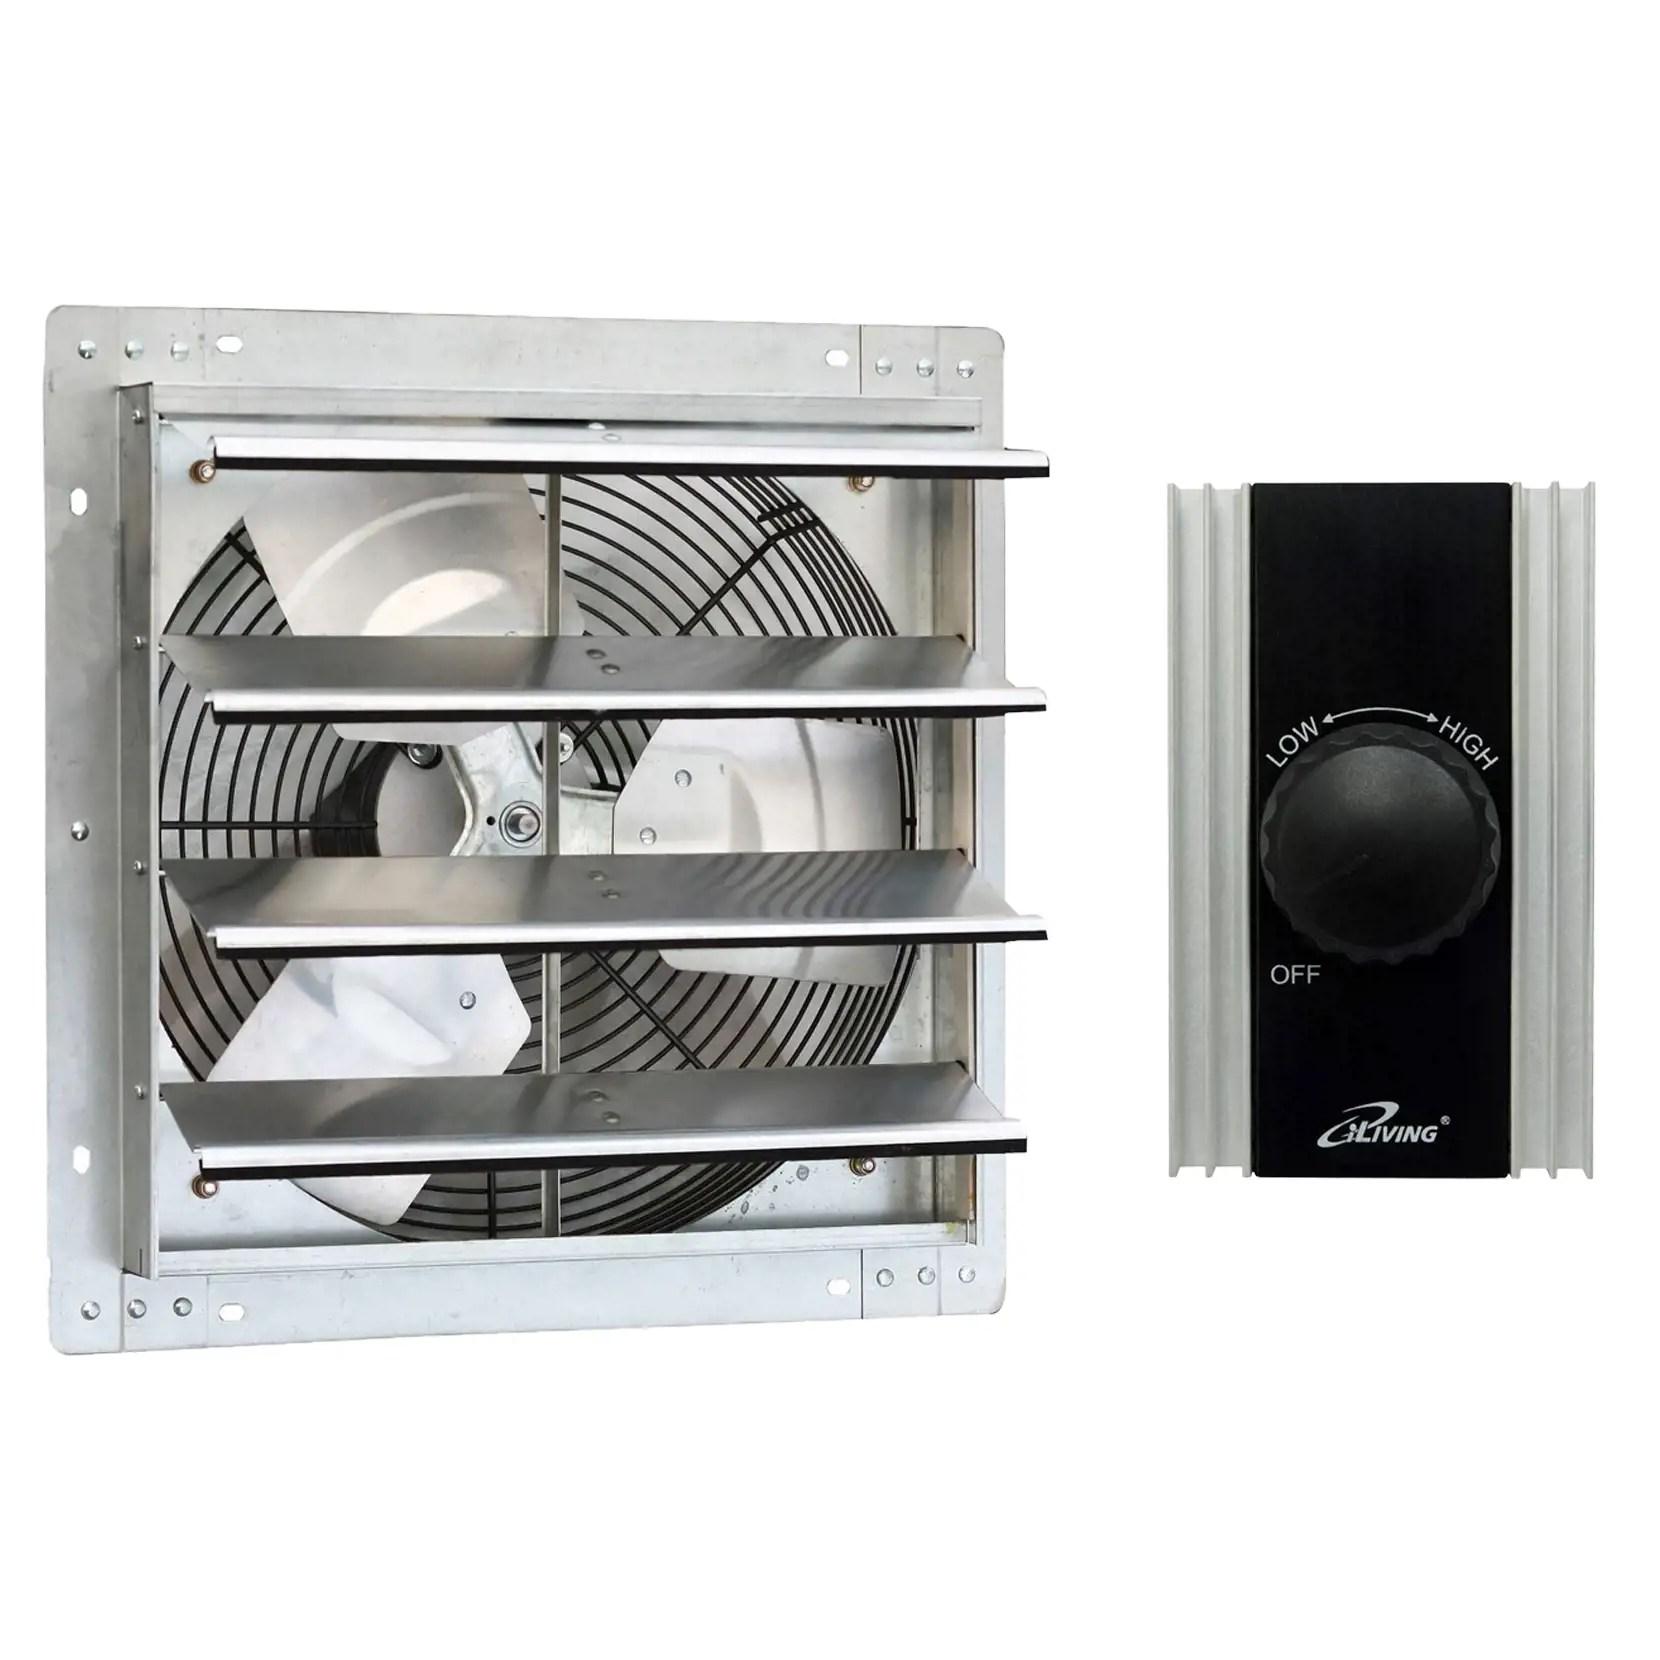 iliving 16 inch variable speed wall mounted steel shutter exhaust fan fan speed controller 120v 8a